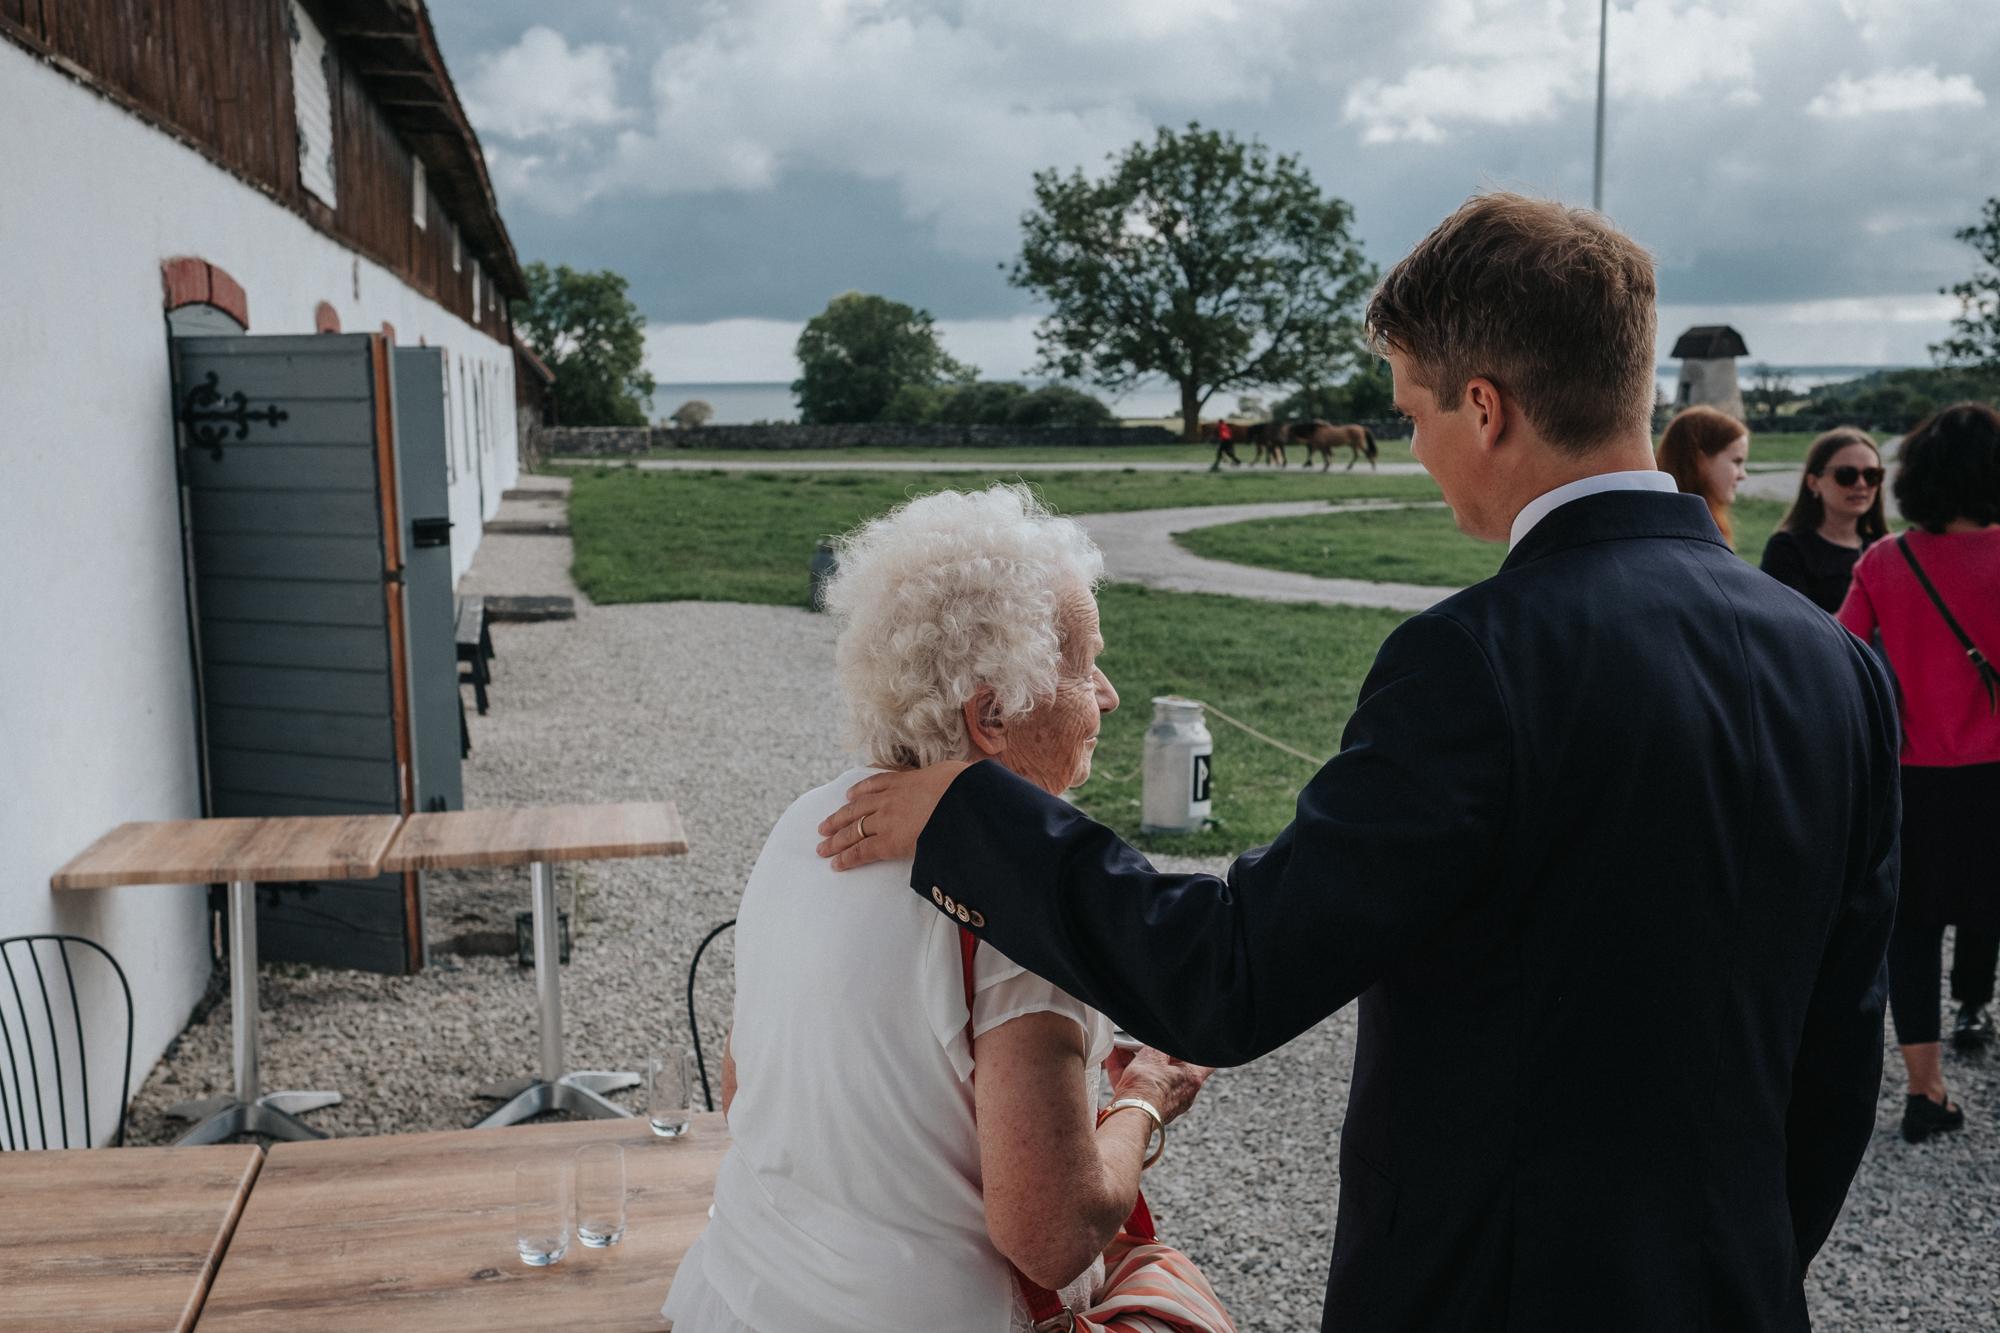 051-bröllop-gåsemora-gårdskrog-neas-fotografi.jpg